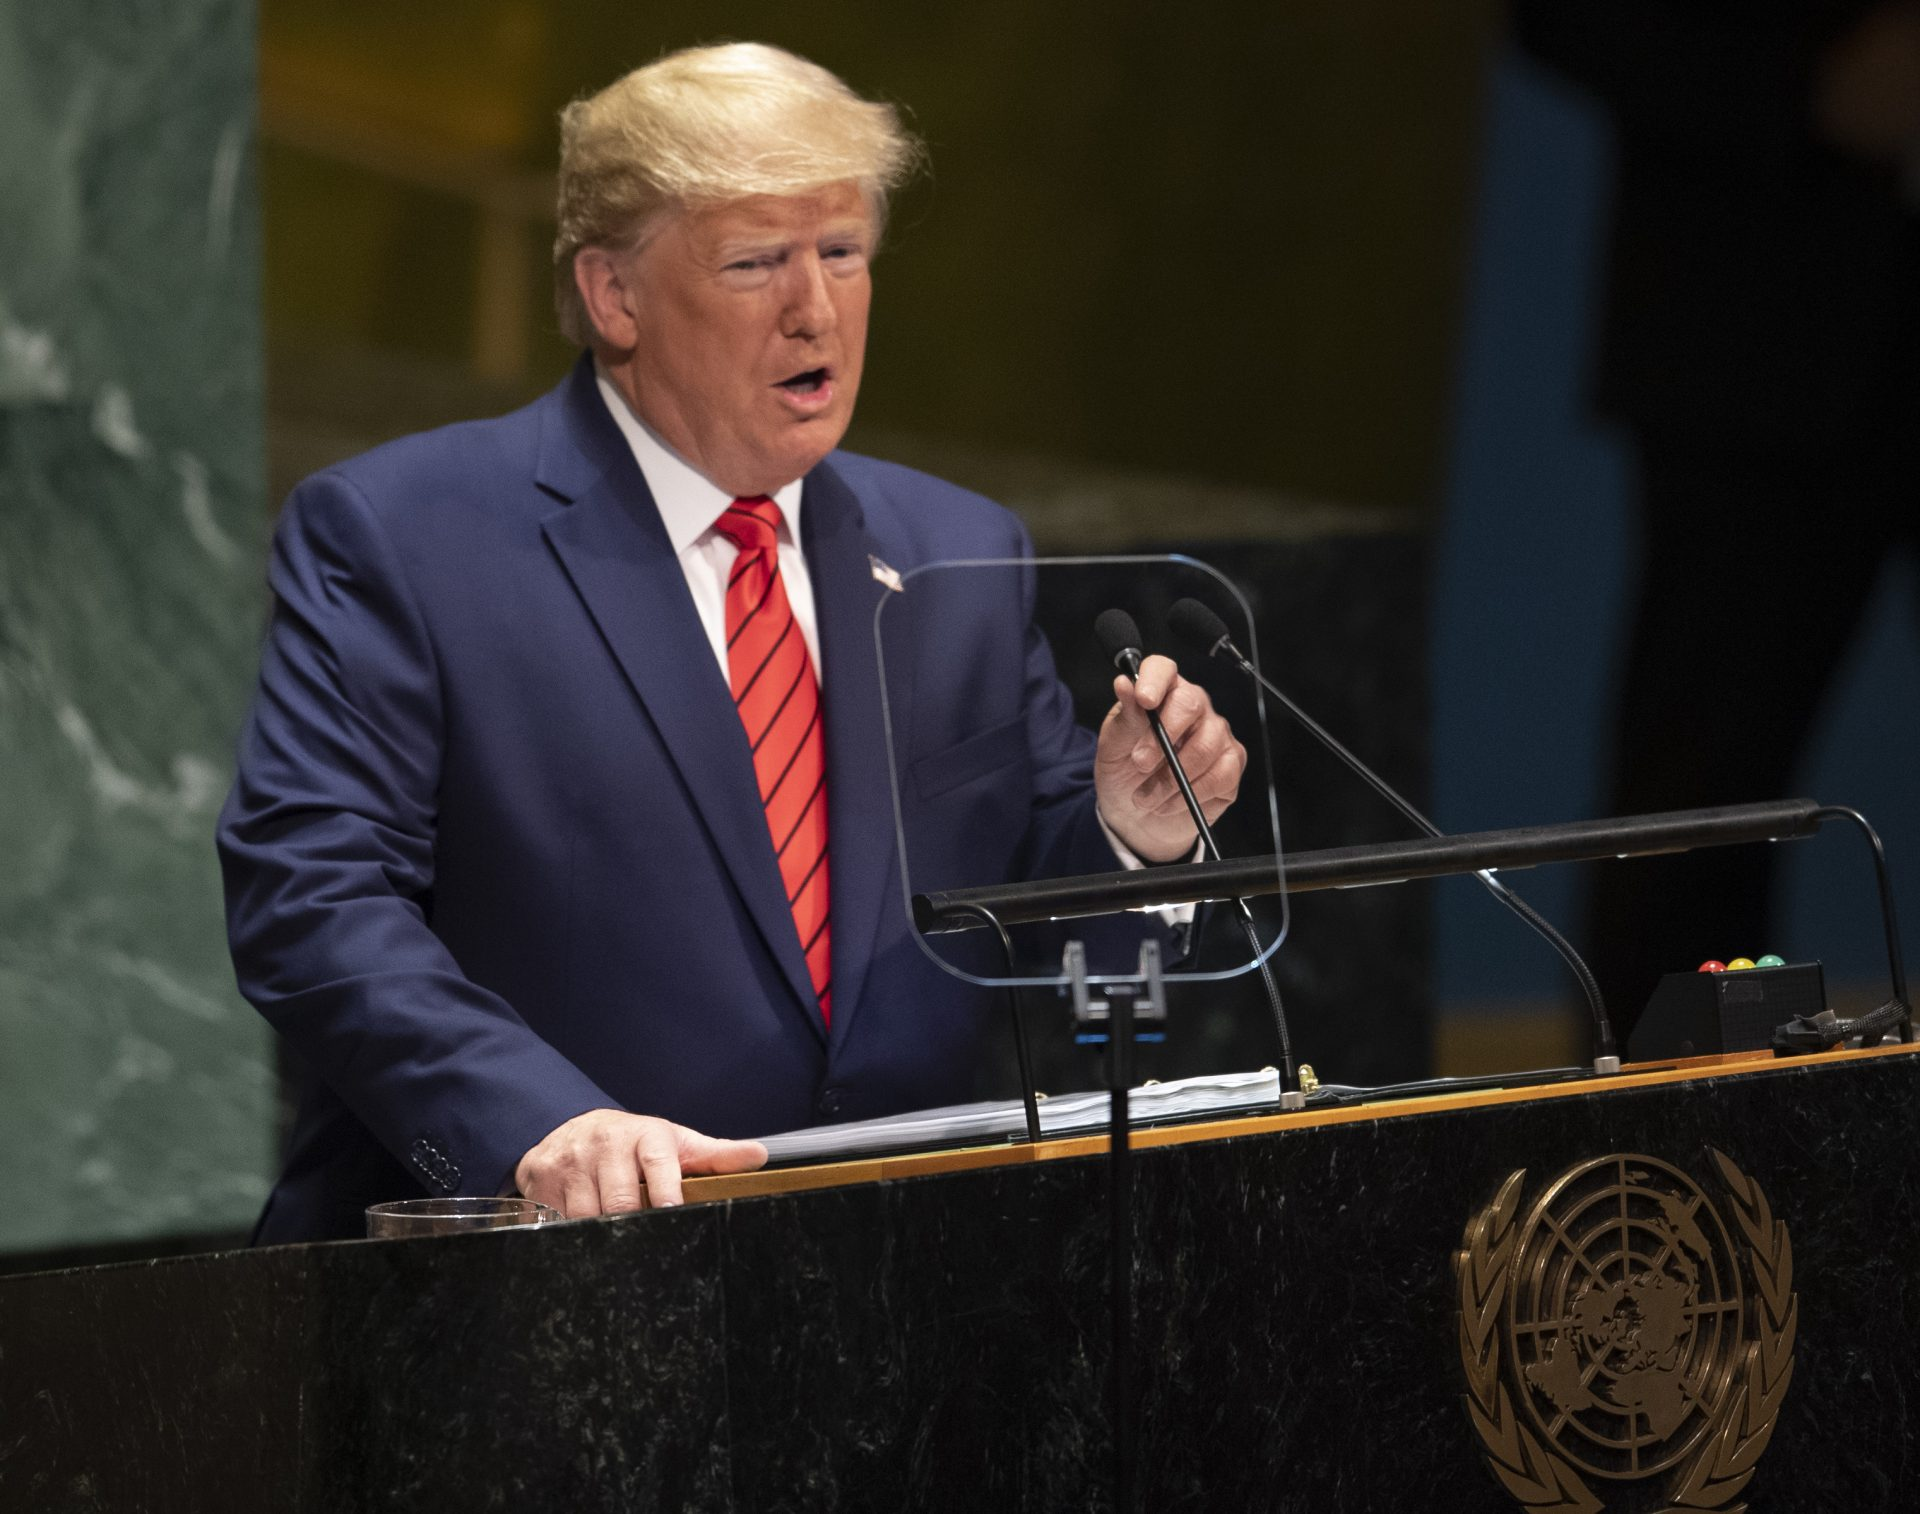 Trump's speech at UN General Assembly